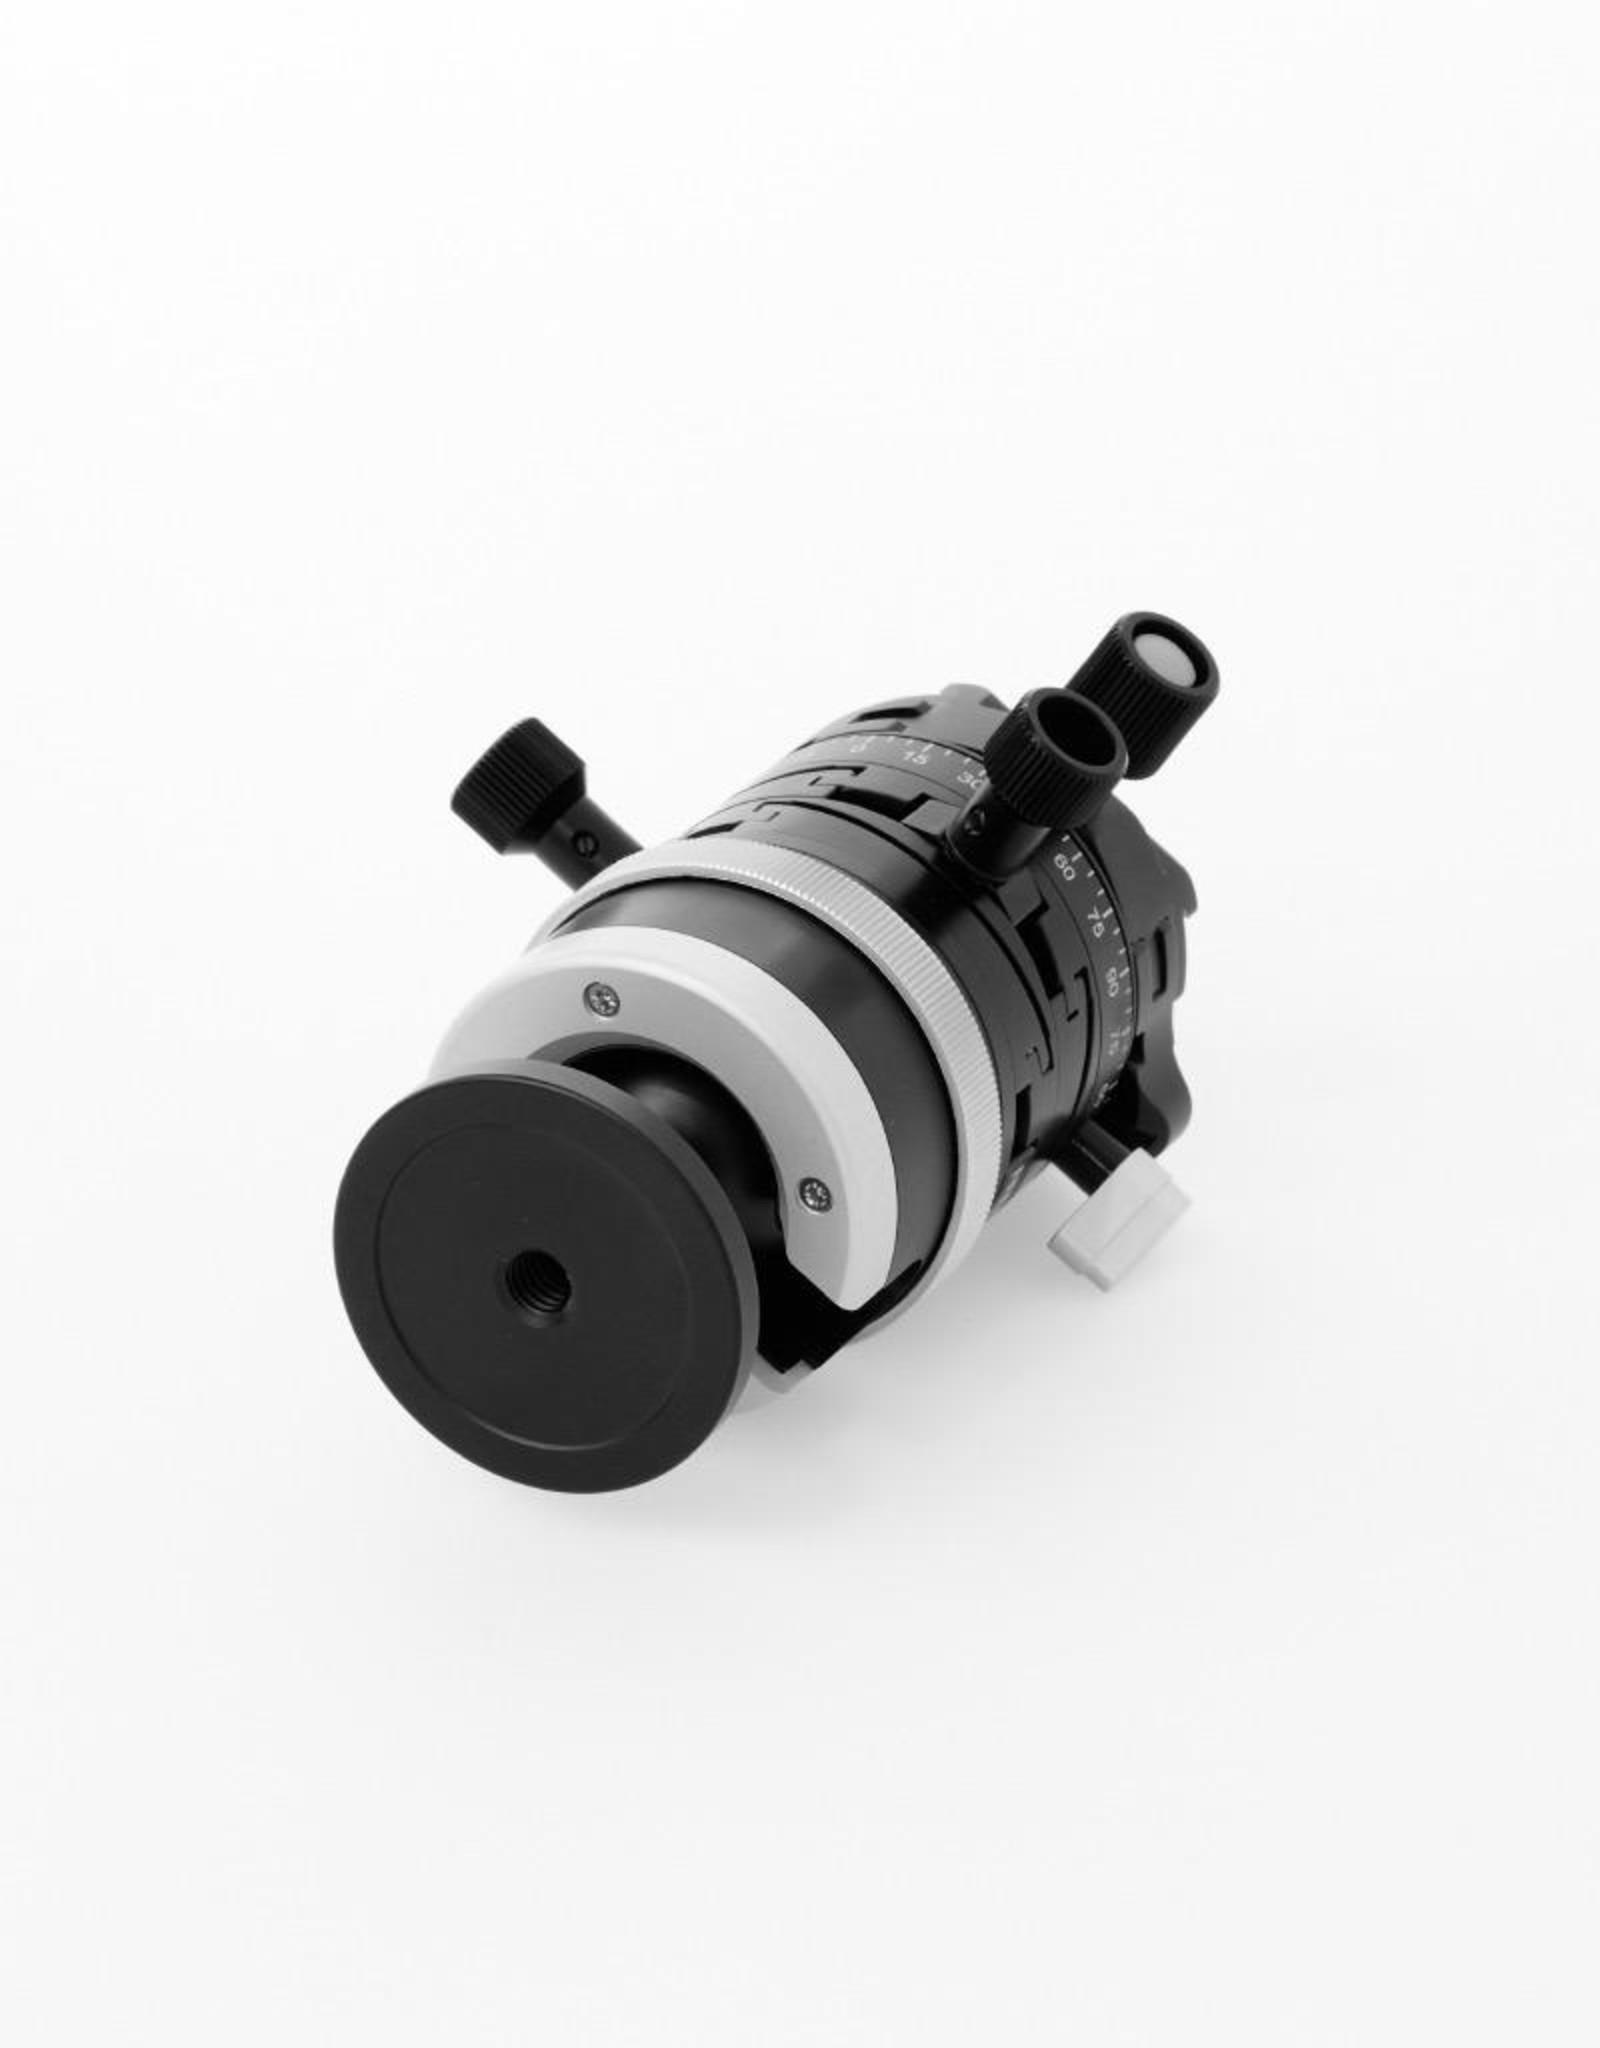 Arca Swiss ARCA-SWISS Monoball p0 hybrid with quick set device Classic